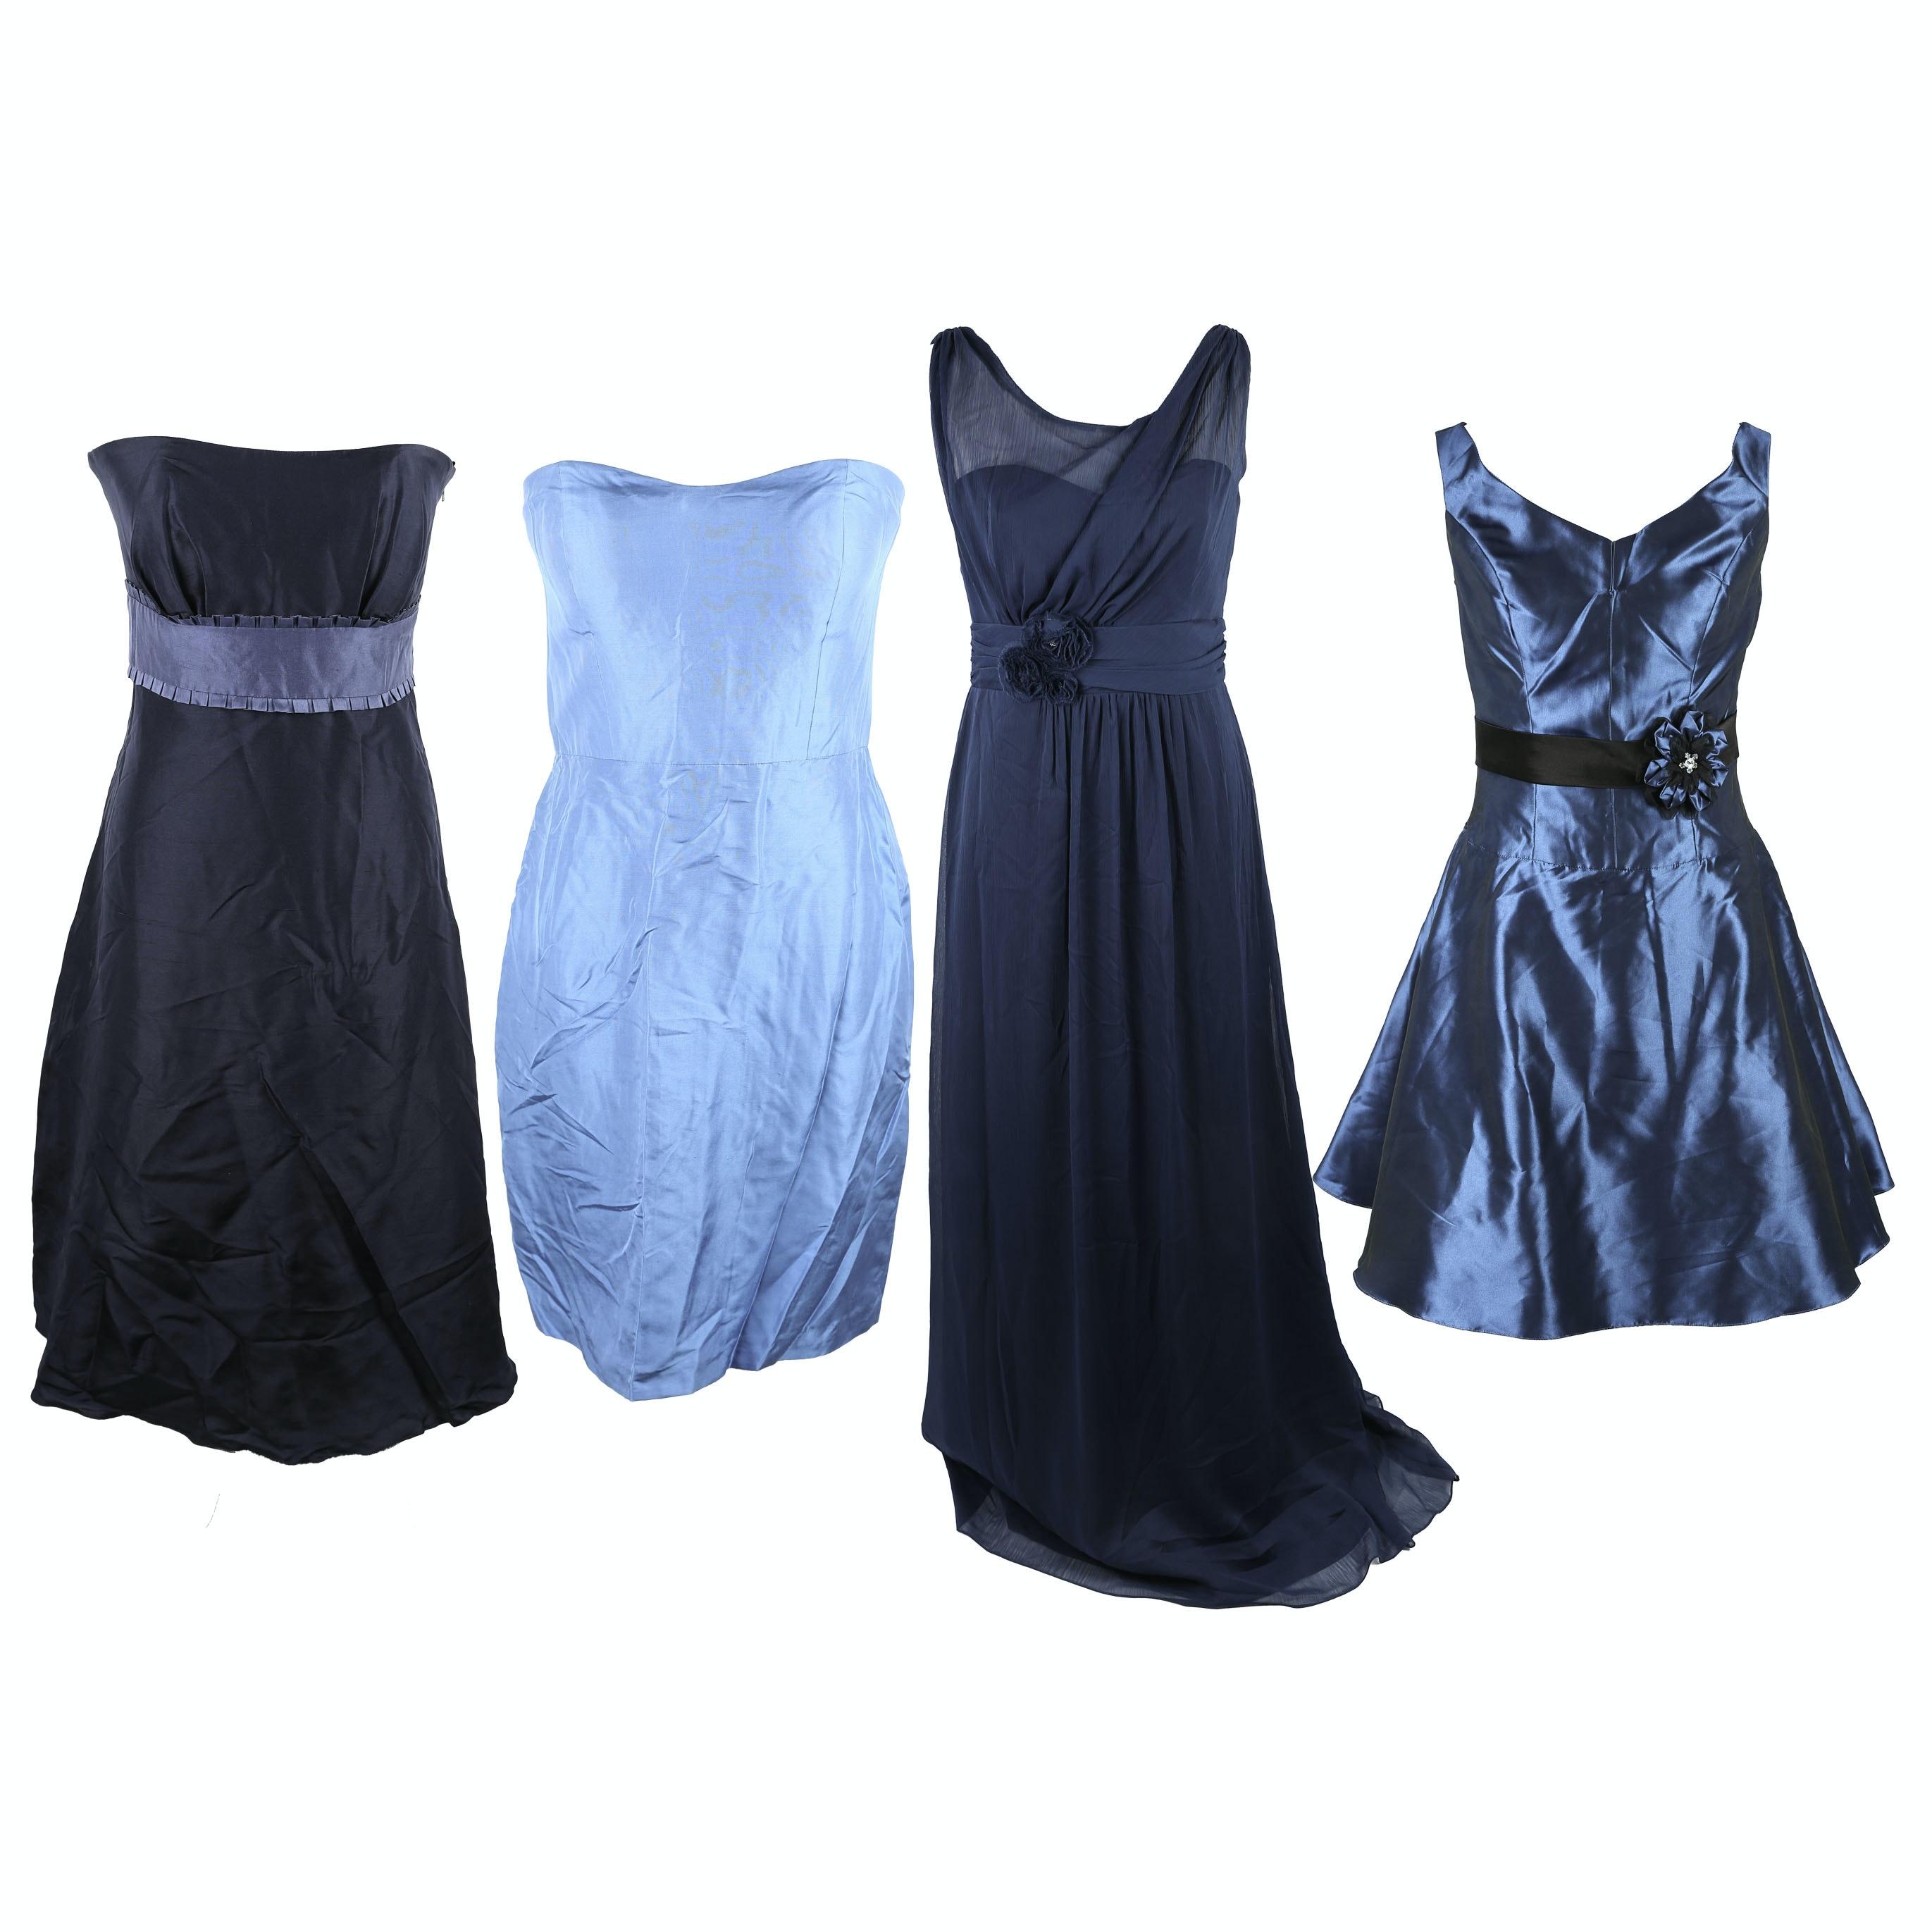 Designer Bridesmaids Dresses featuring Jenny Yoo